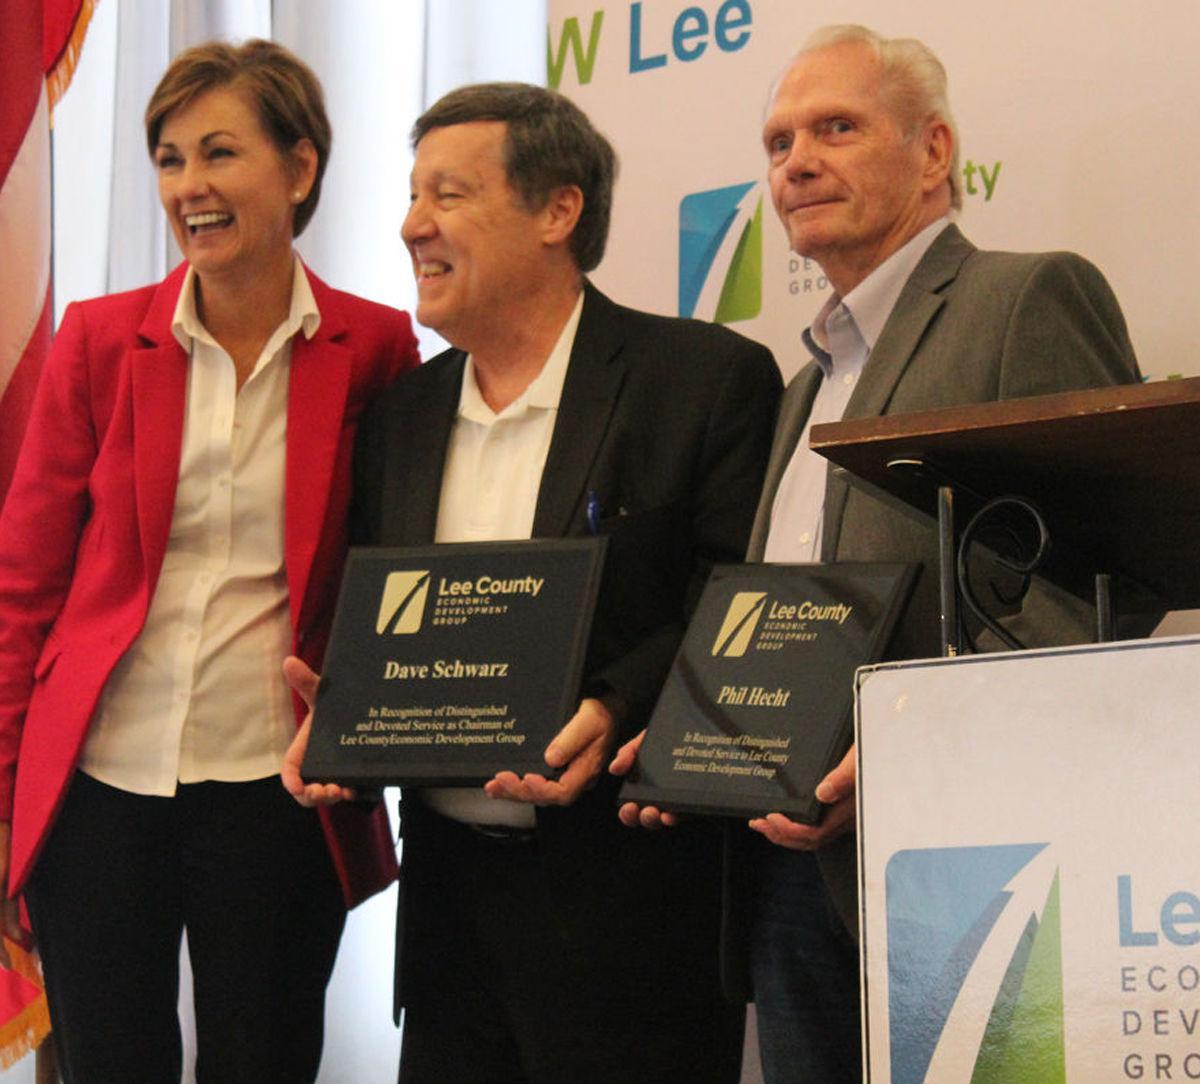 LCEDG Awards